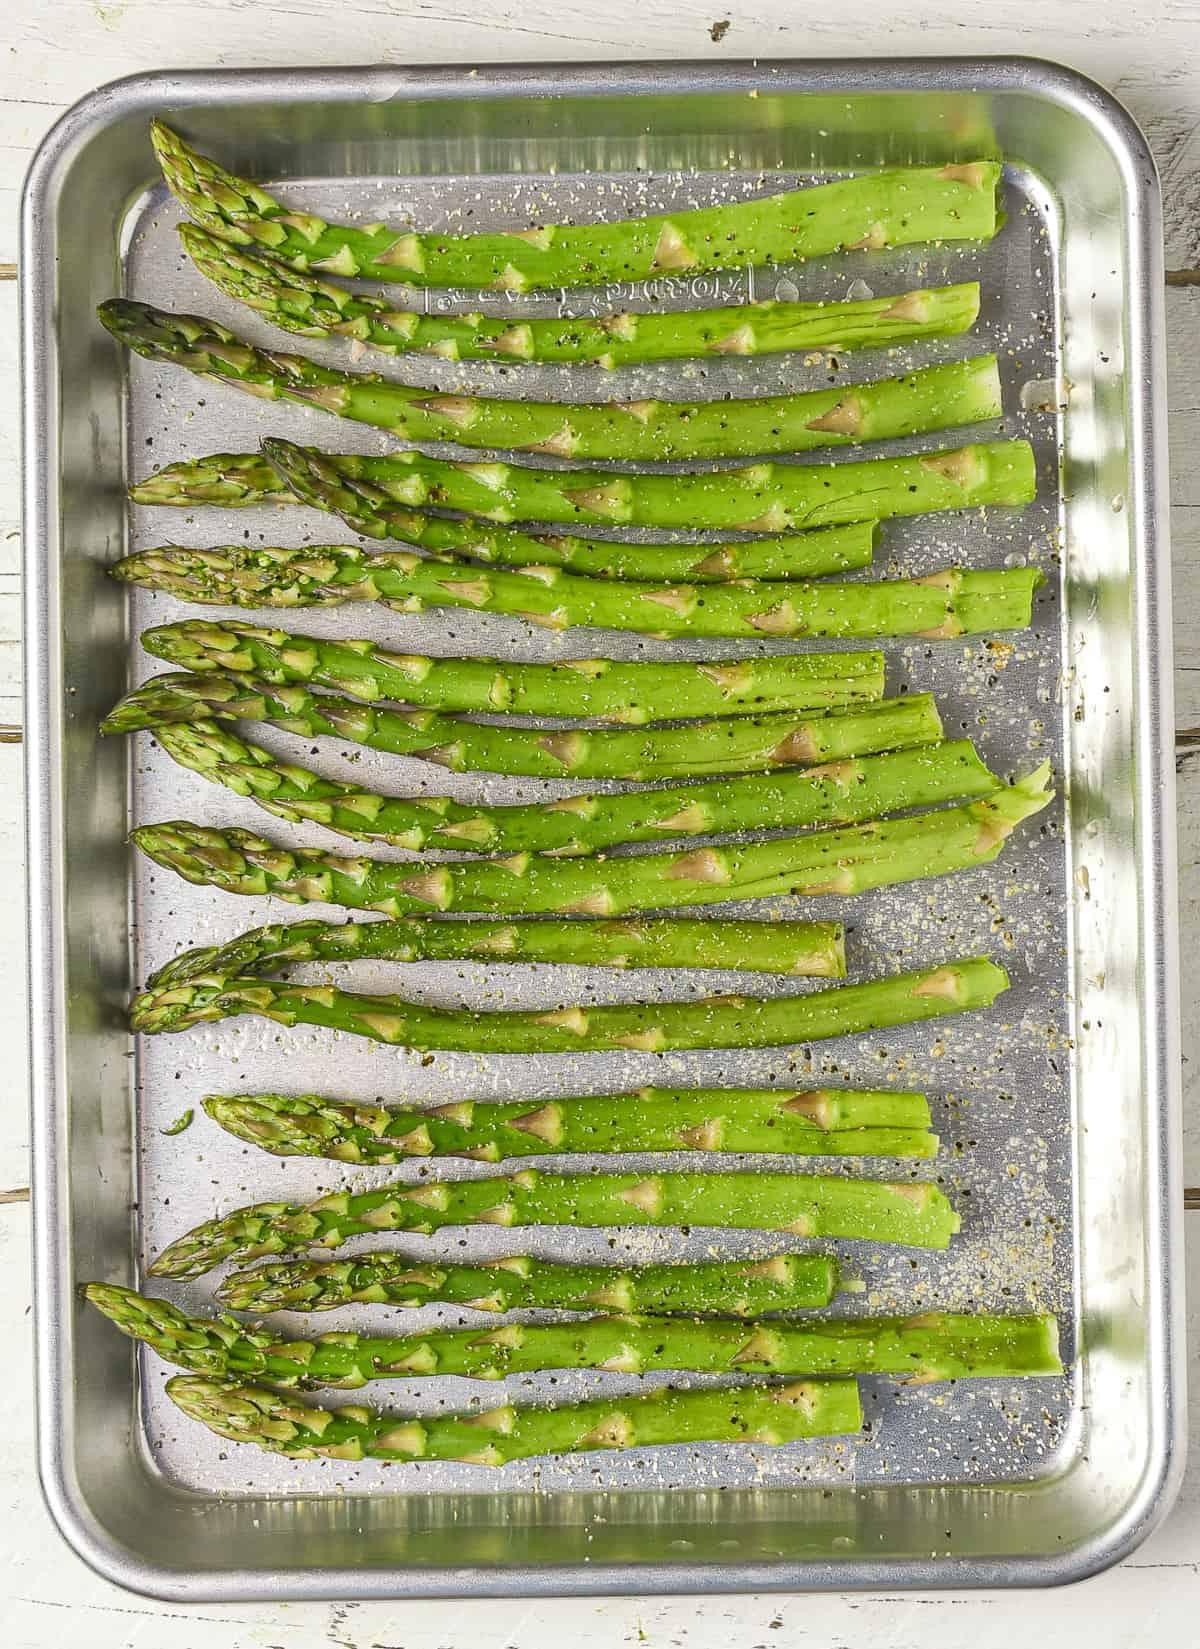 Seasoned asparagus on baking sheet.